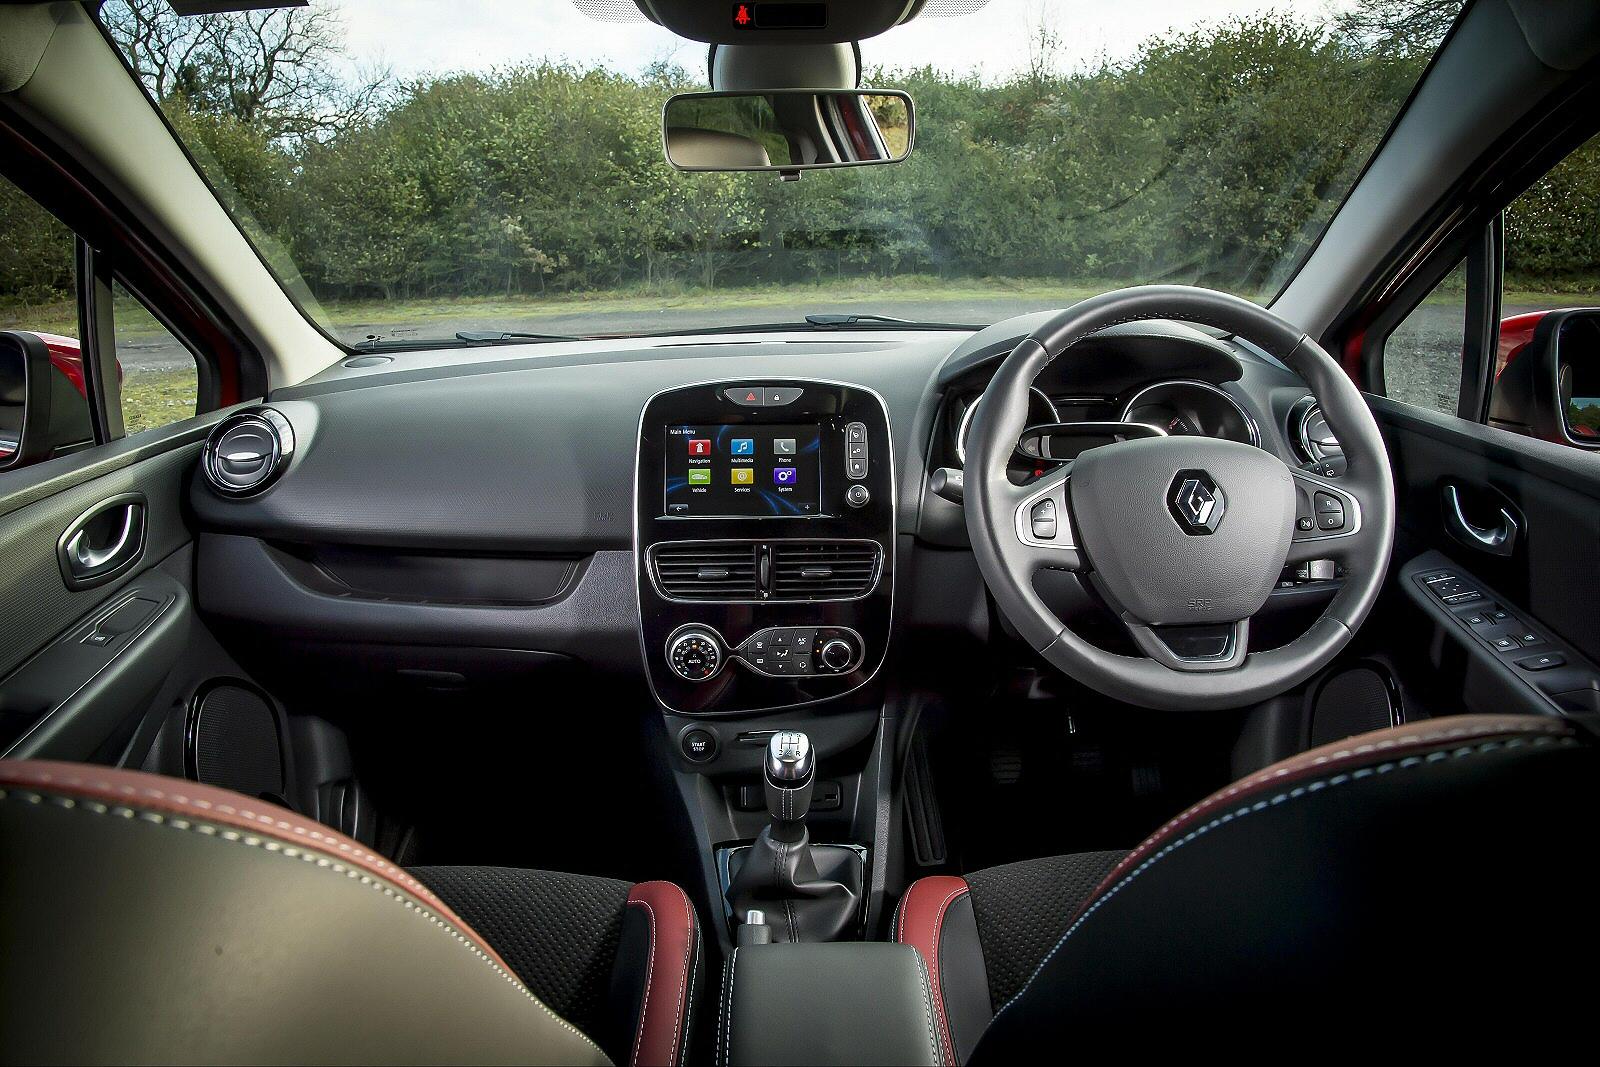 New Renault Clio 1.5 Dci 90 Gt Line 5Dr Diesel Hatchback for Sale   Bristol  Street